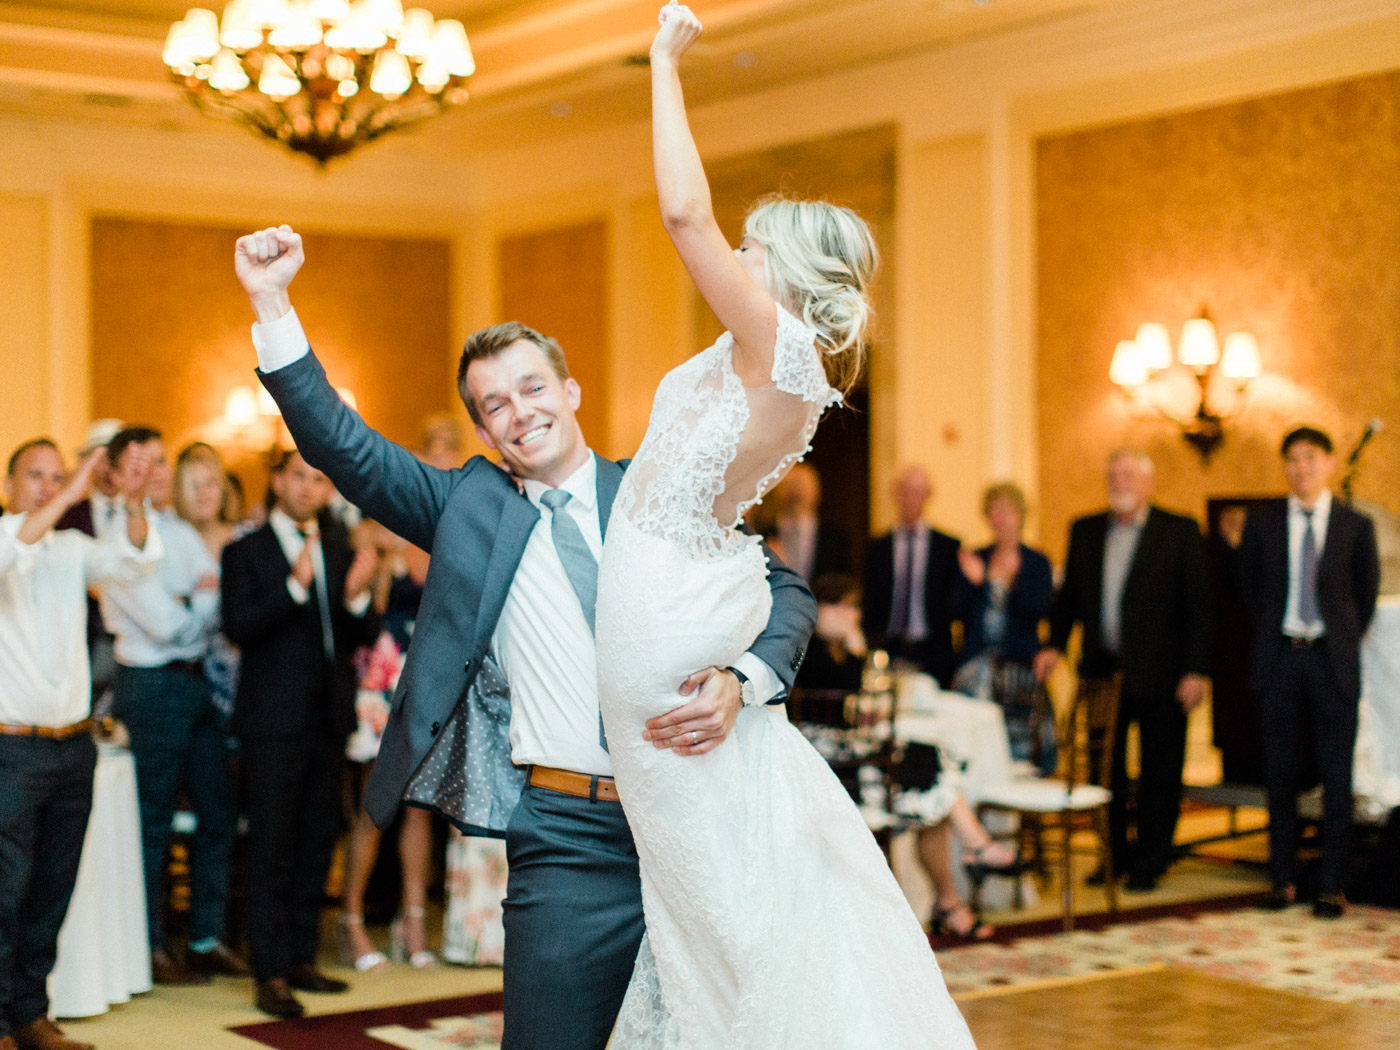 Toronto-Muskoka-wedding-photographer-summery-fun-documentary-the-marriott-rosseau138.jpg